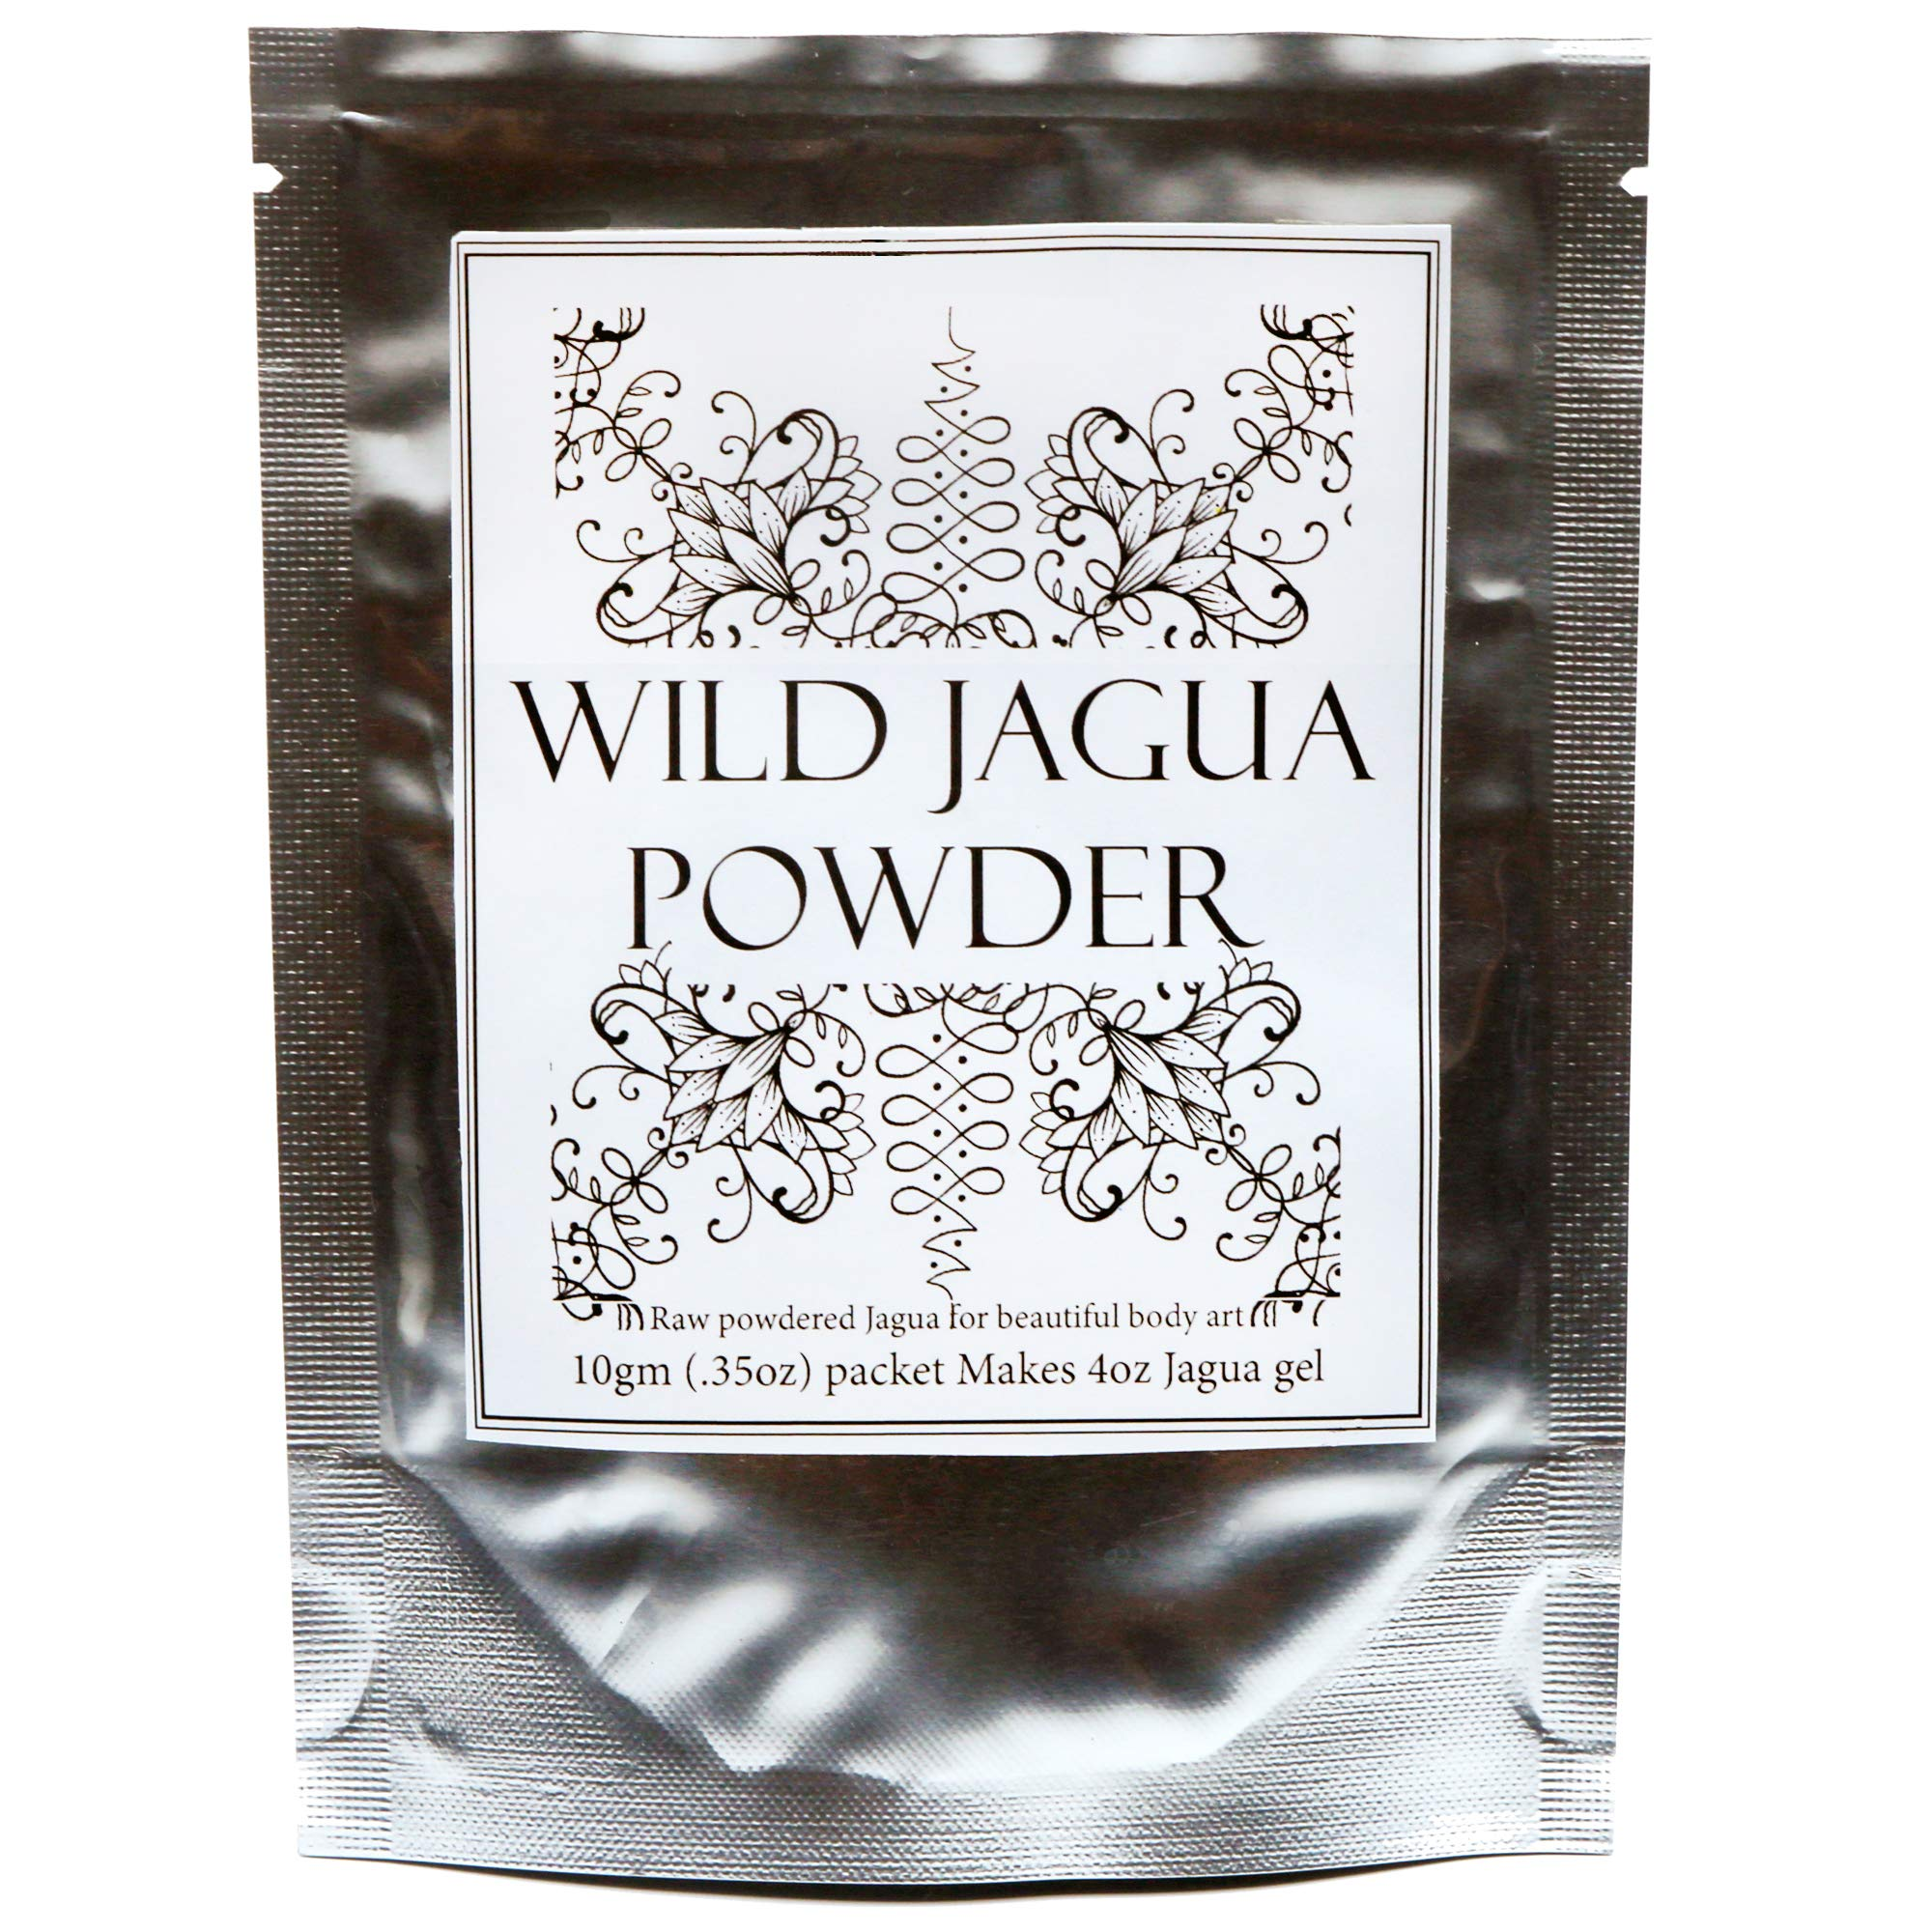 Premium Raw Jagua (Genipa americana extract) Powder-Mix. Makes 4oz Black Gel Ink for Henna-Style Temporary Tattoos